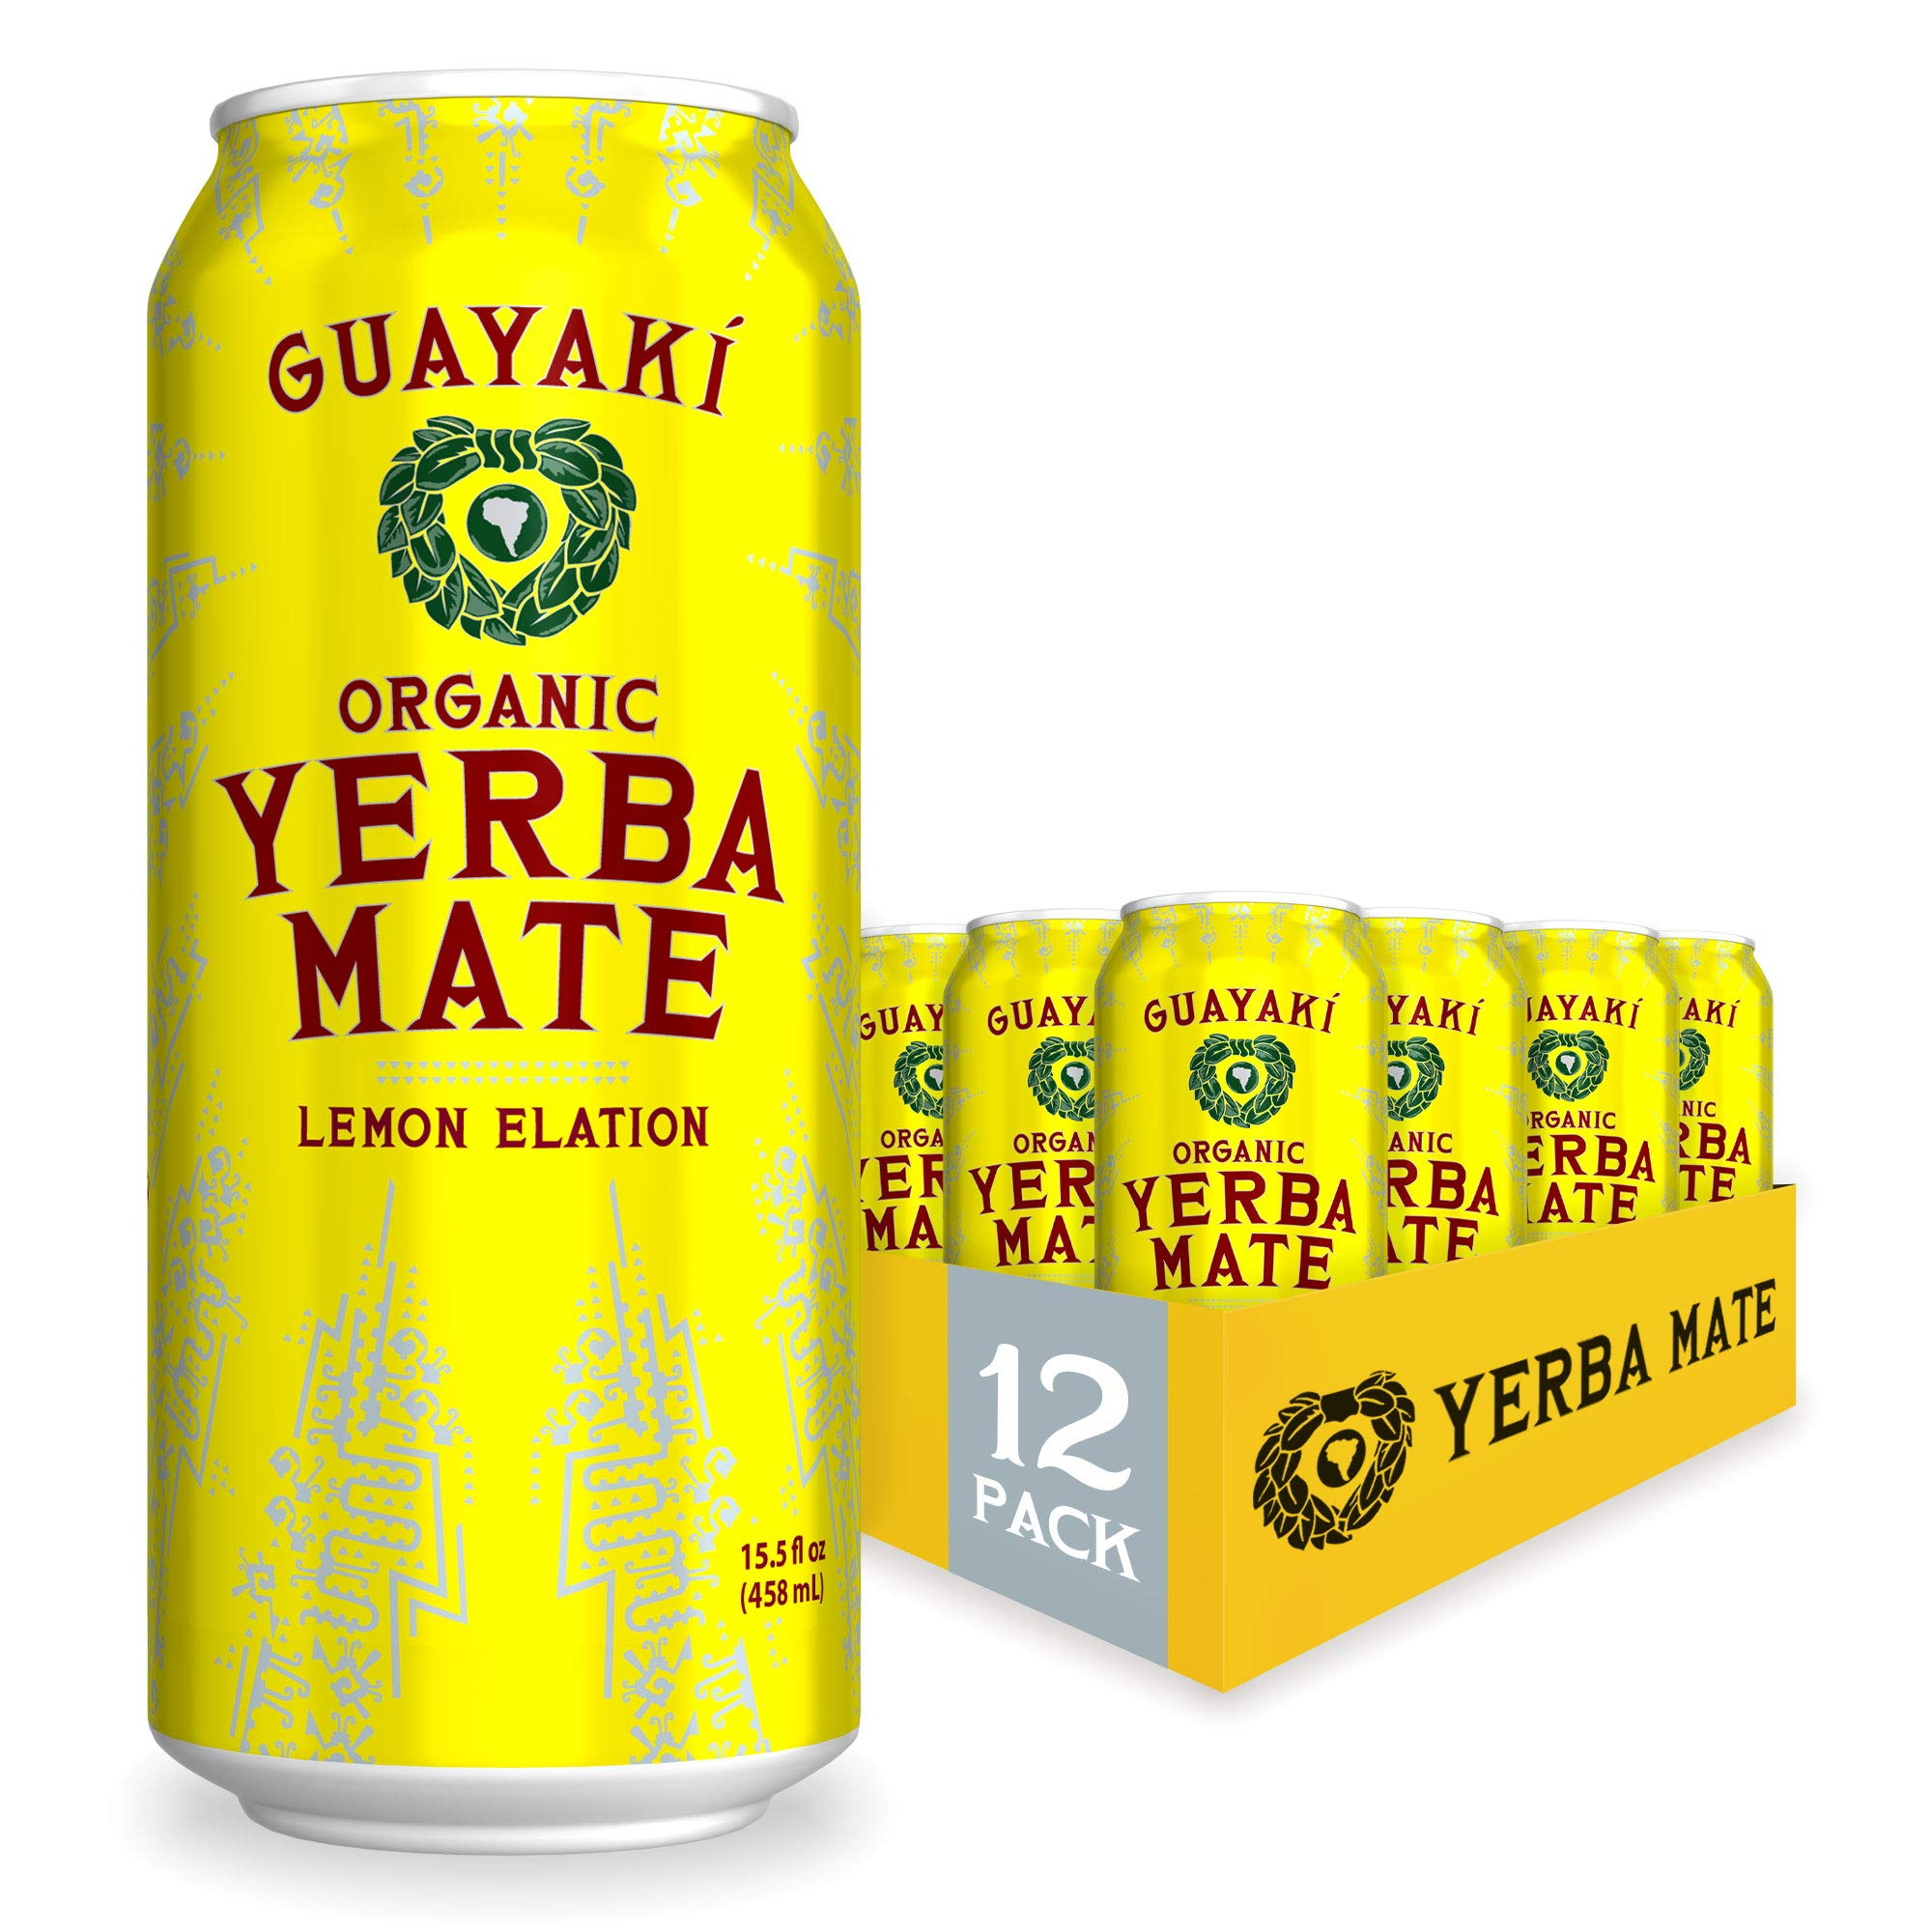 Guayaki Yerba Mate, Lemon Elation, Organic Alternative to Energy, Coffee and Tea Drinks, 15.5 Ounce Cans, (Pack of 12), 150mg Caffeine